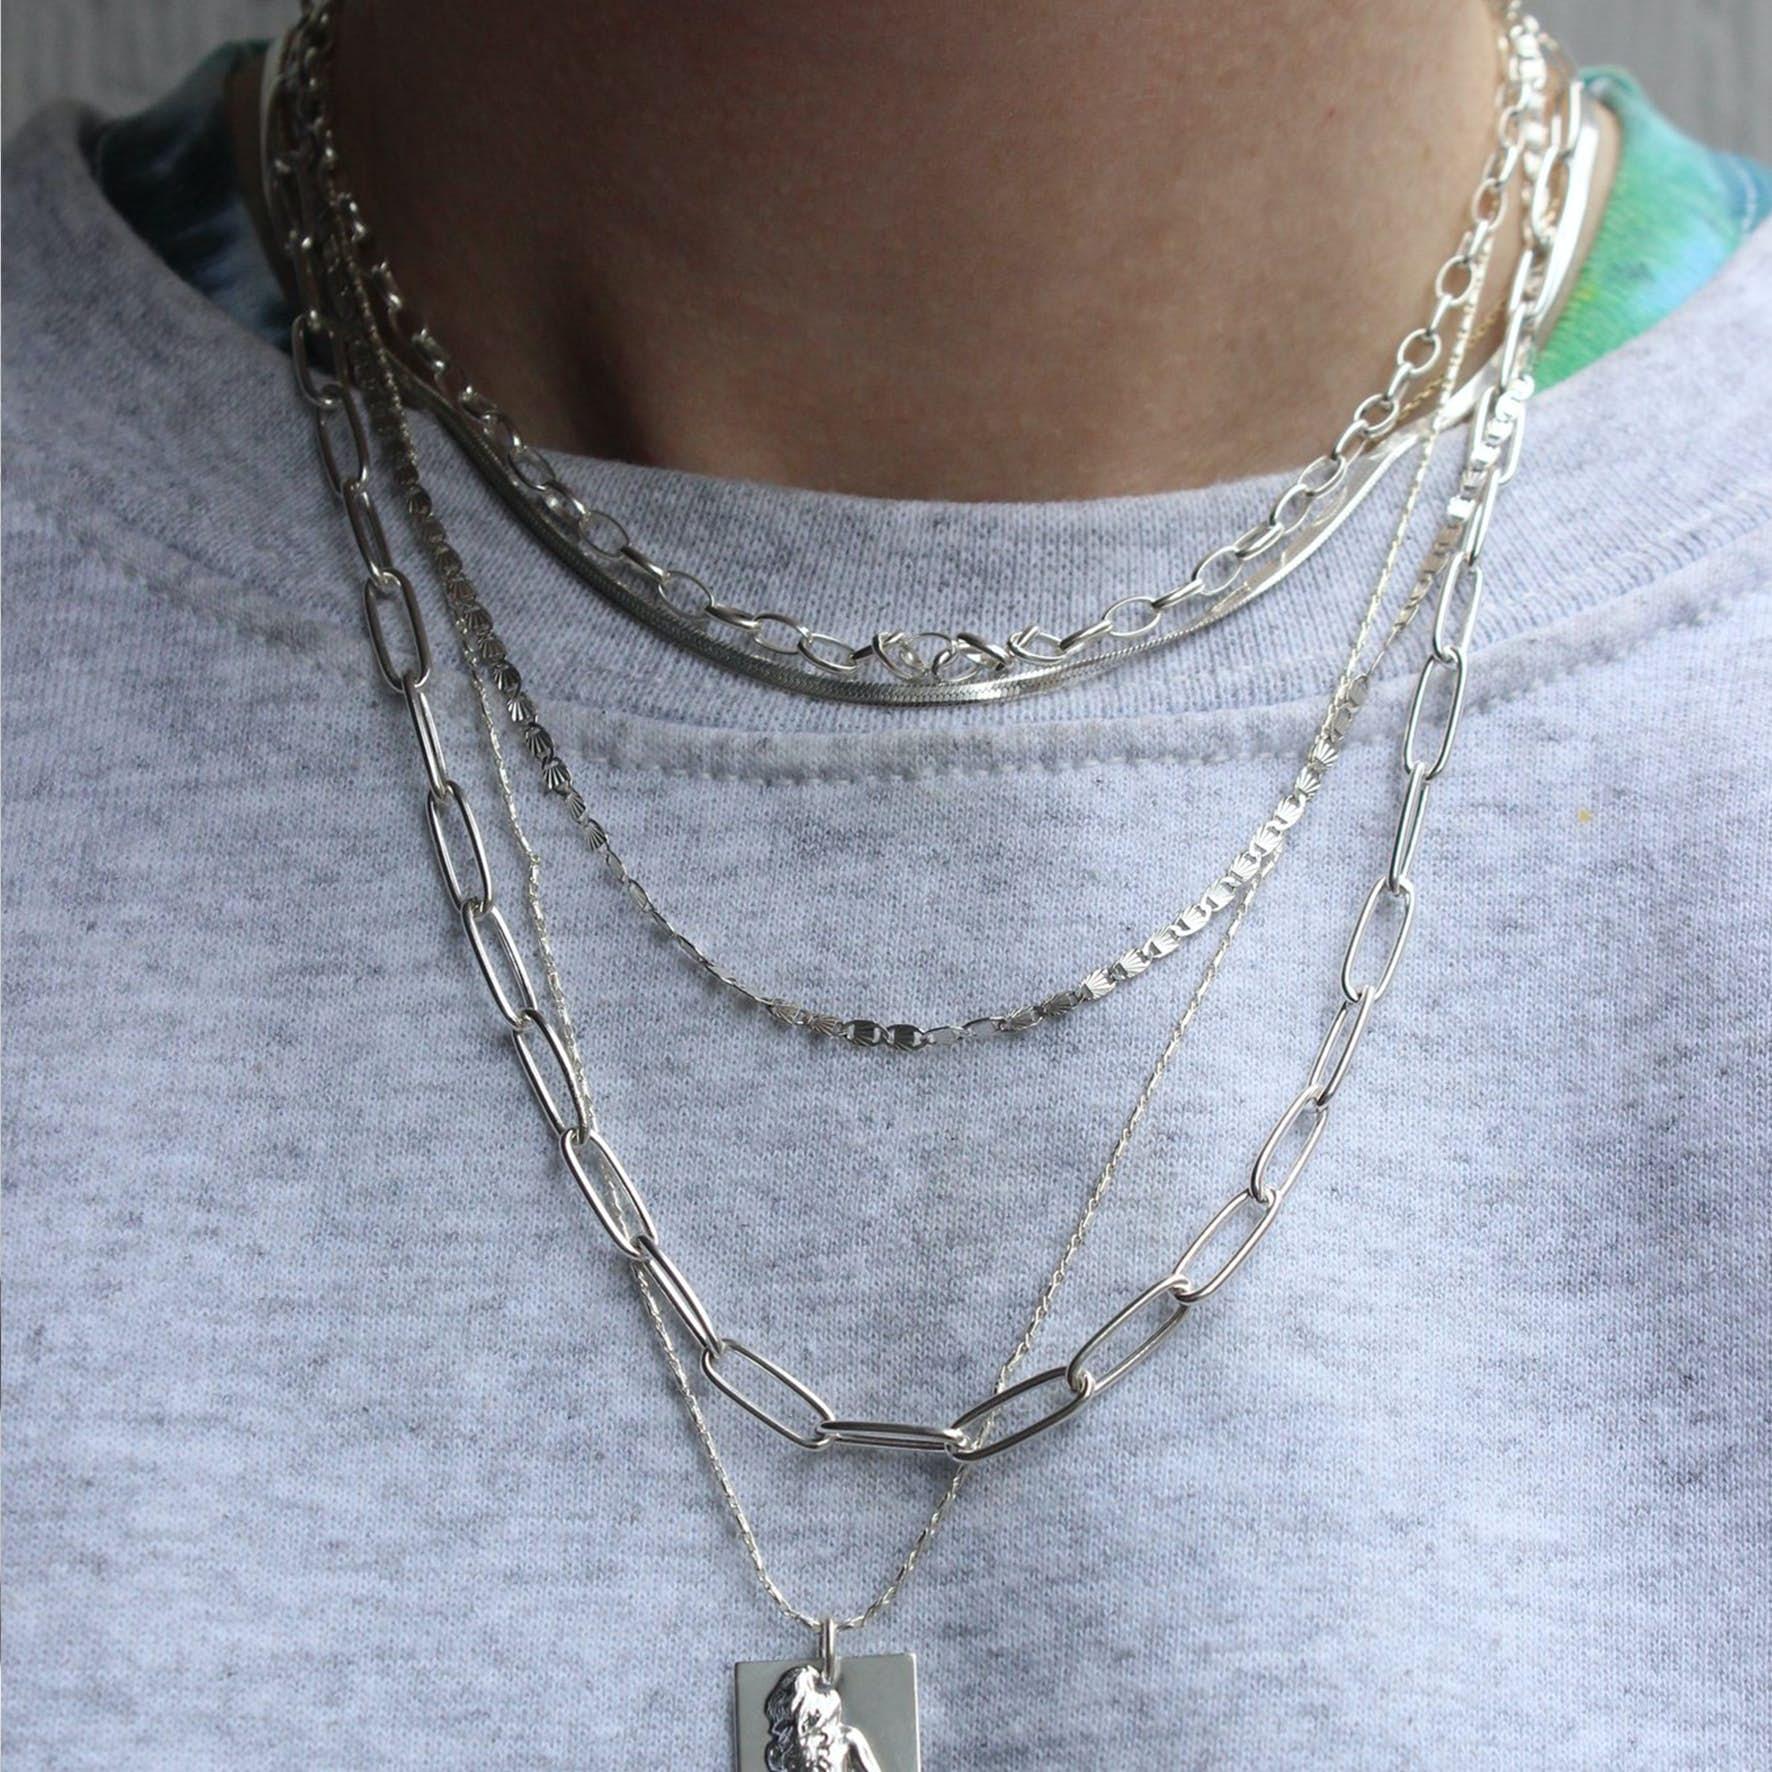 Gilly Necklace fra Pico i Sølv Sterling 925